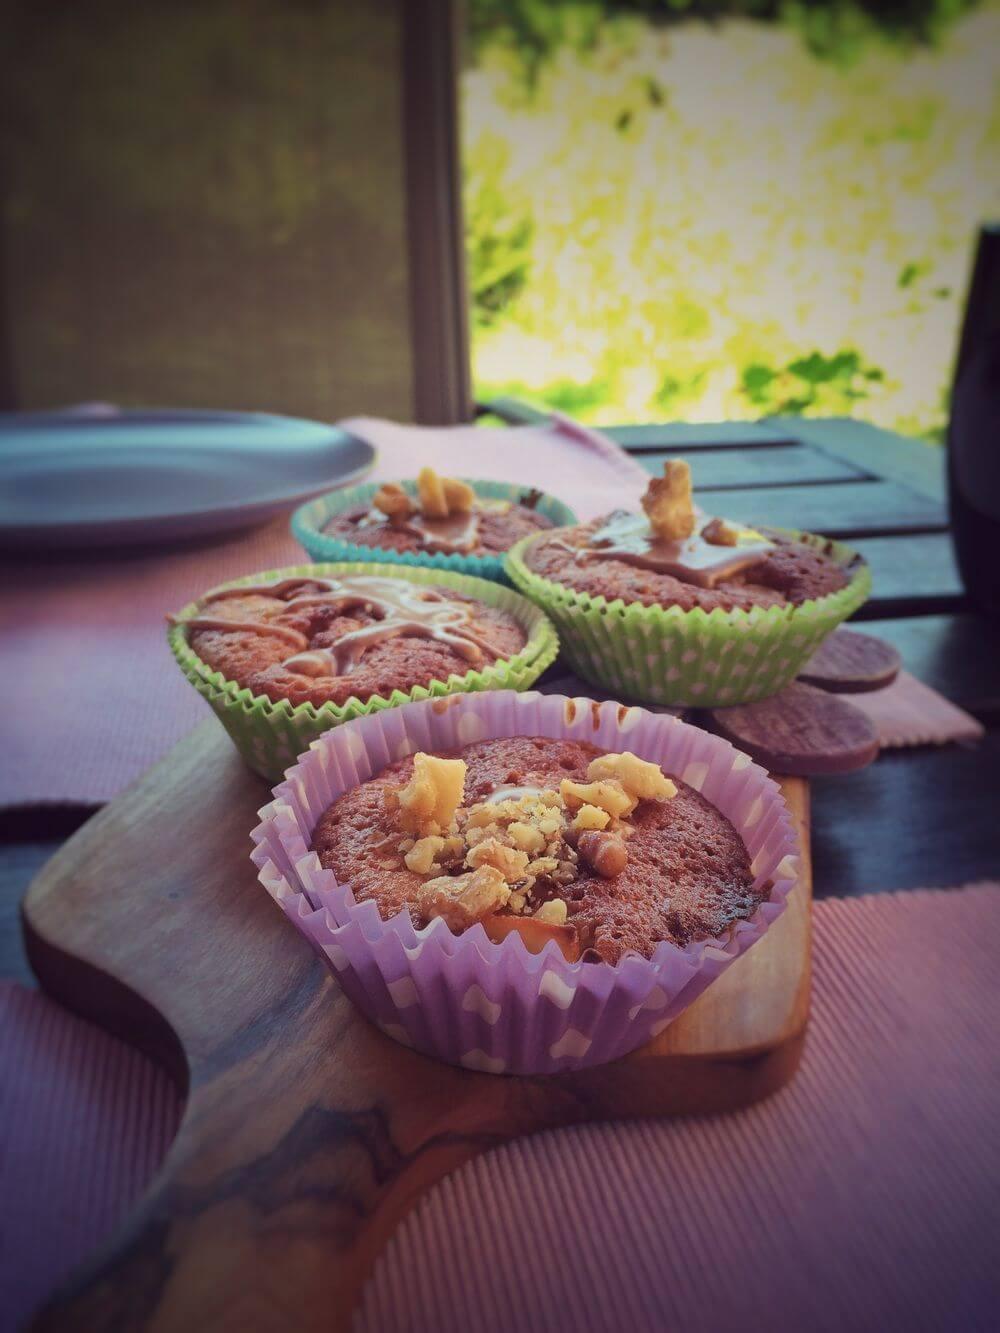 Walnuss Muffins